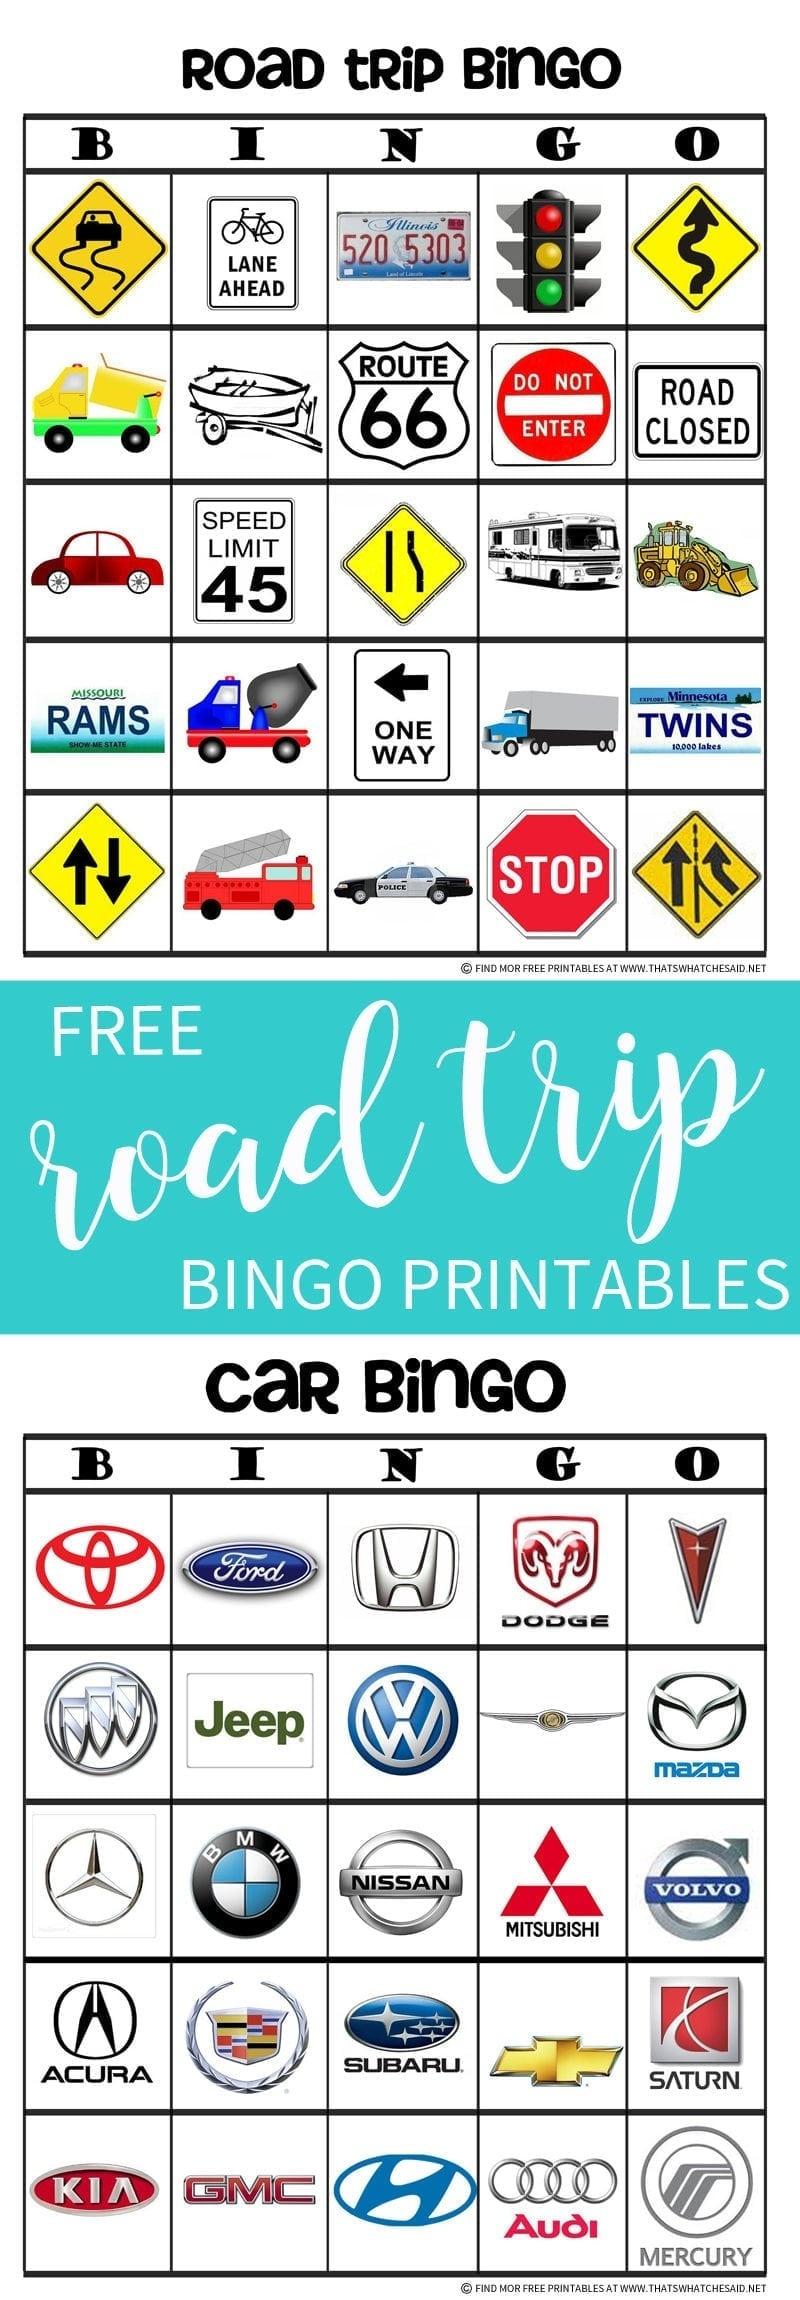 Road Trip Bingo Game Free Printable - That's What Che Said - Free Printable Car Bingo